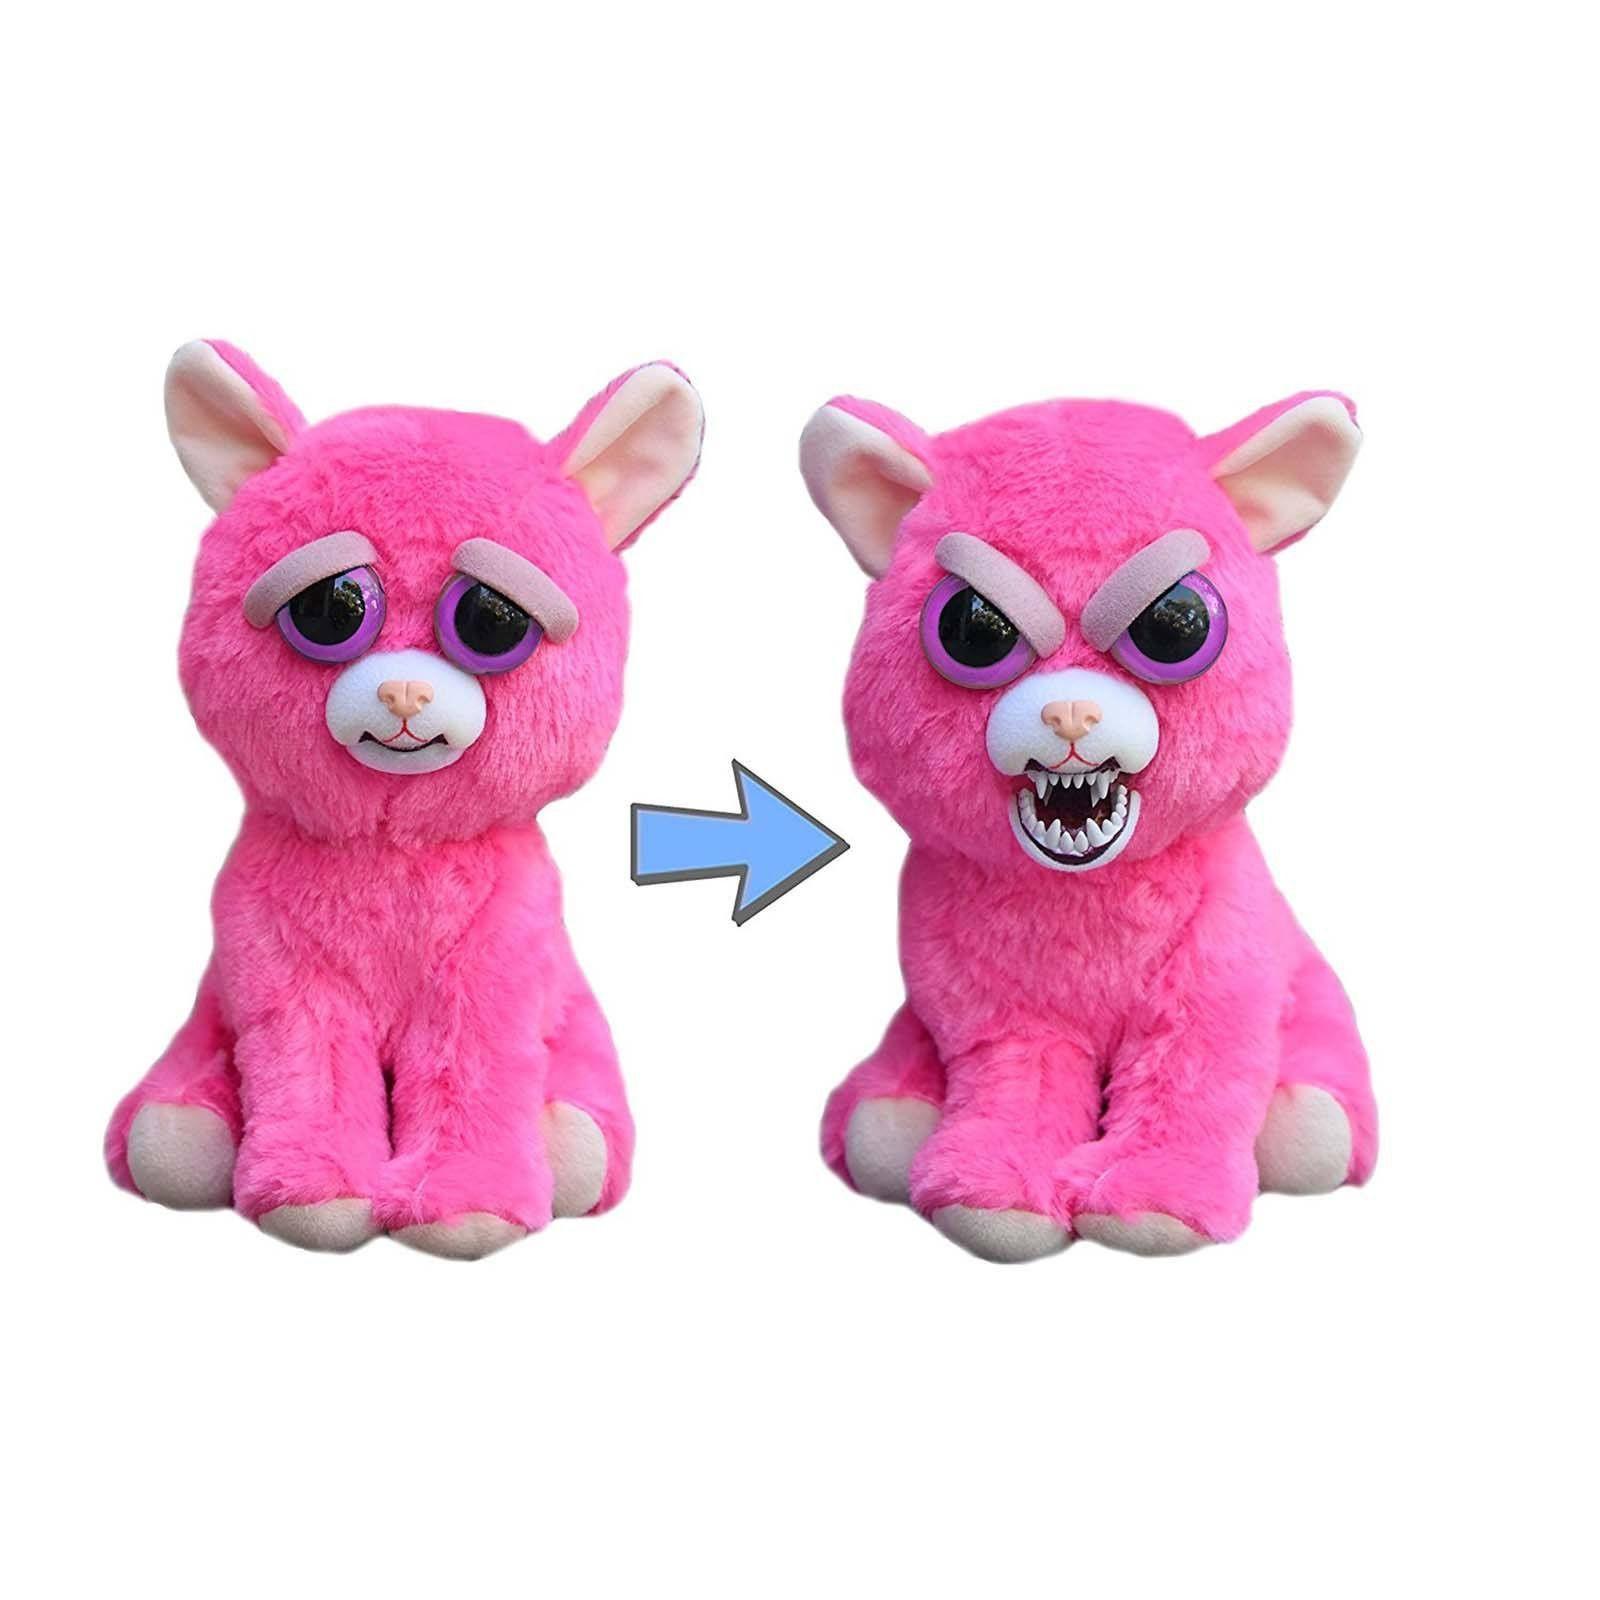 Feisty Pets Lady Monstertruck The Pink Cat Plush Figure Cat